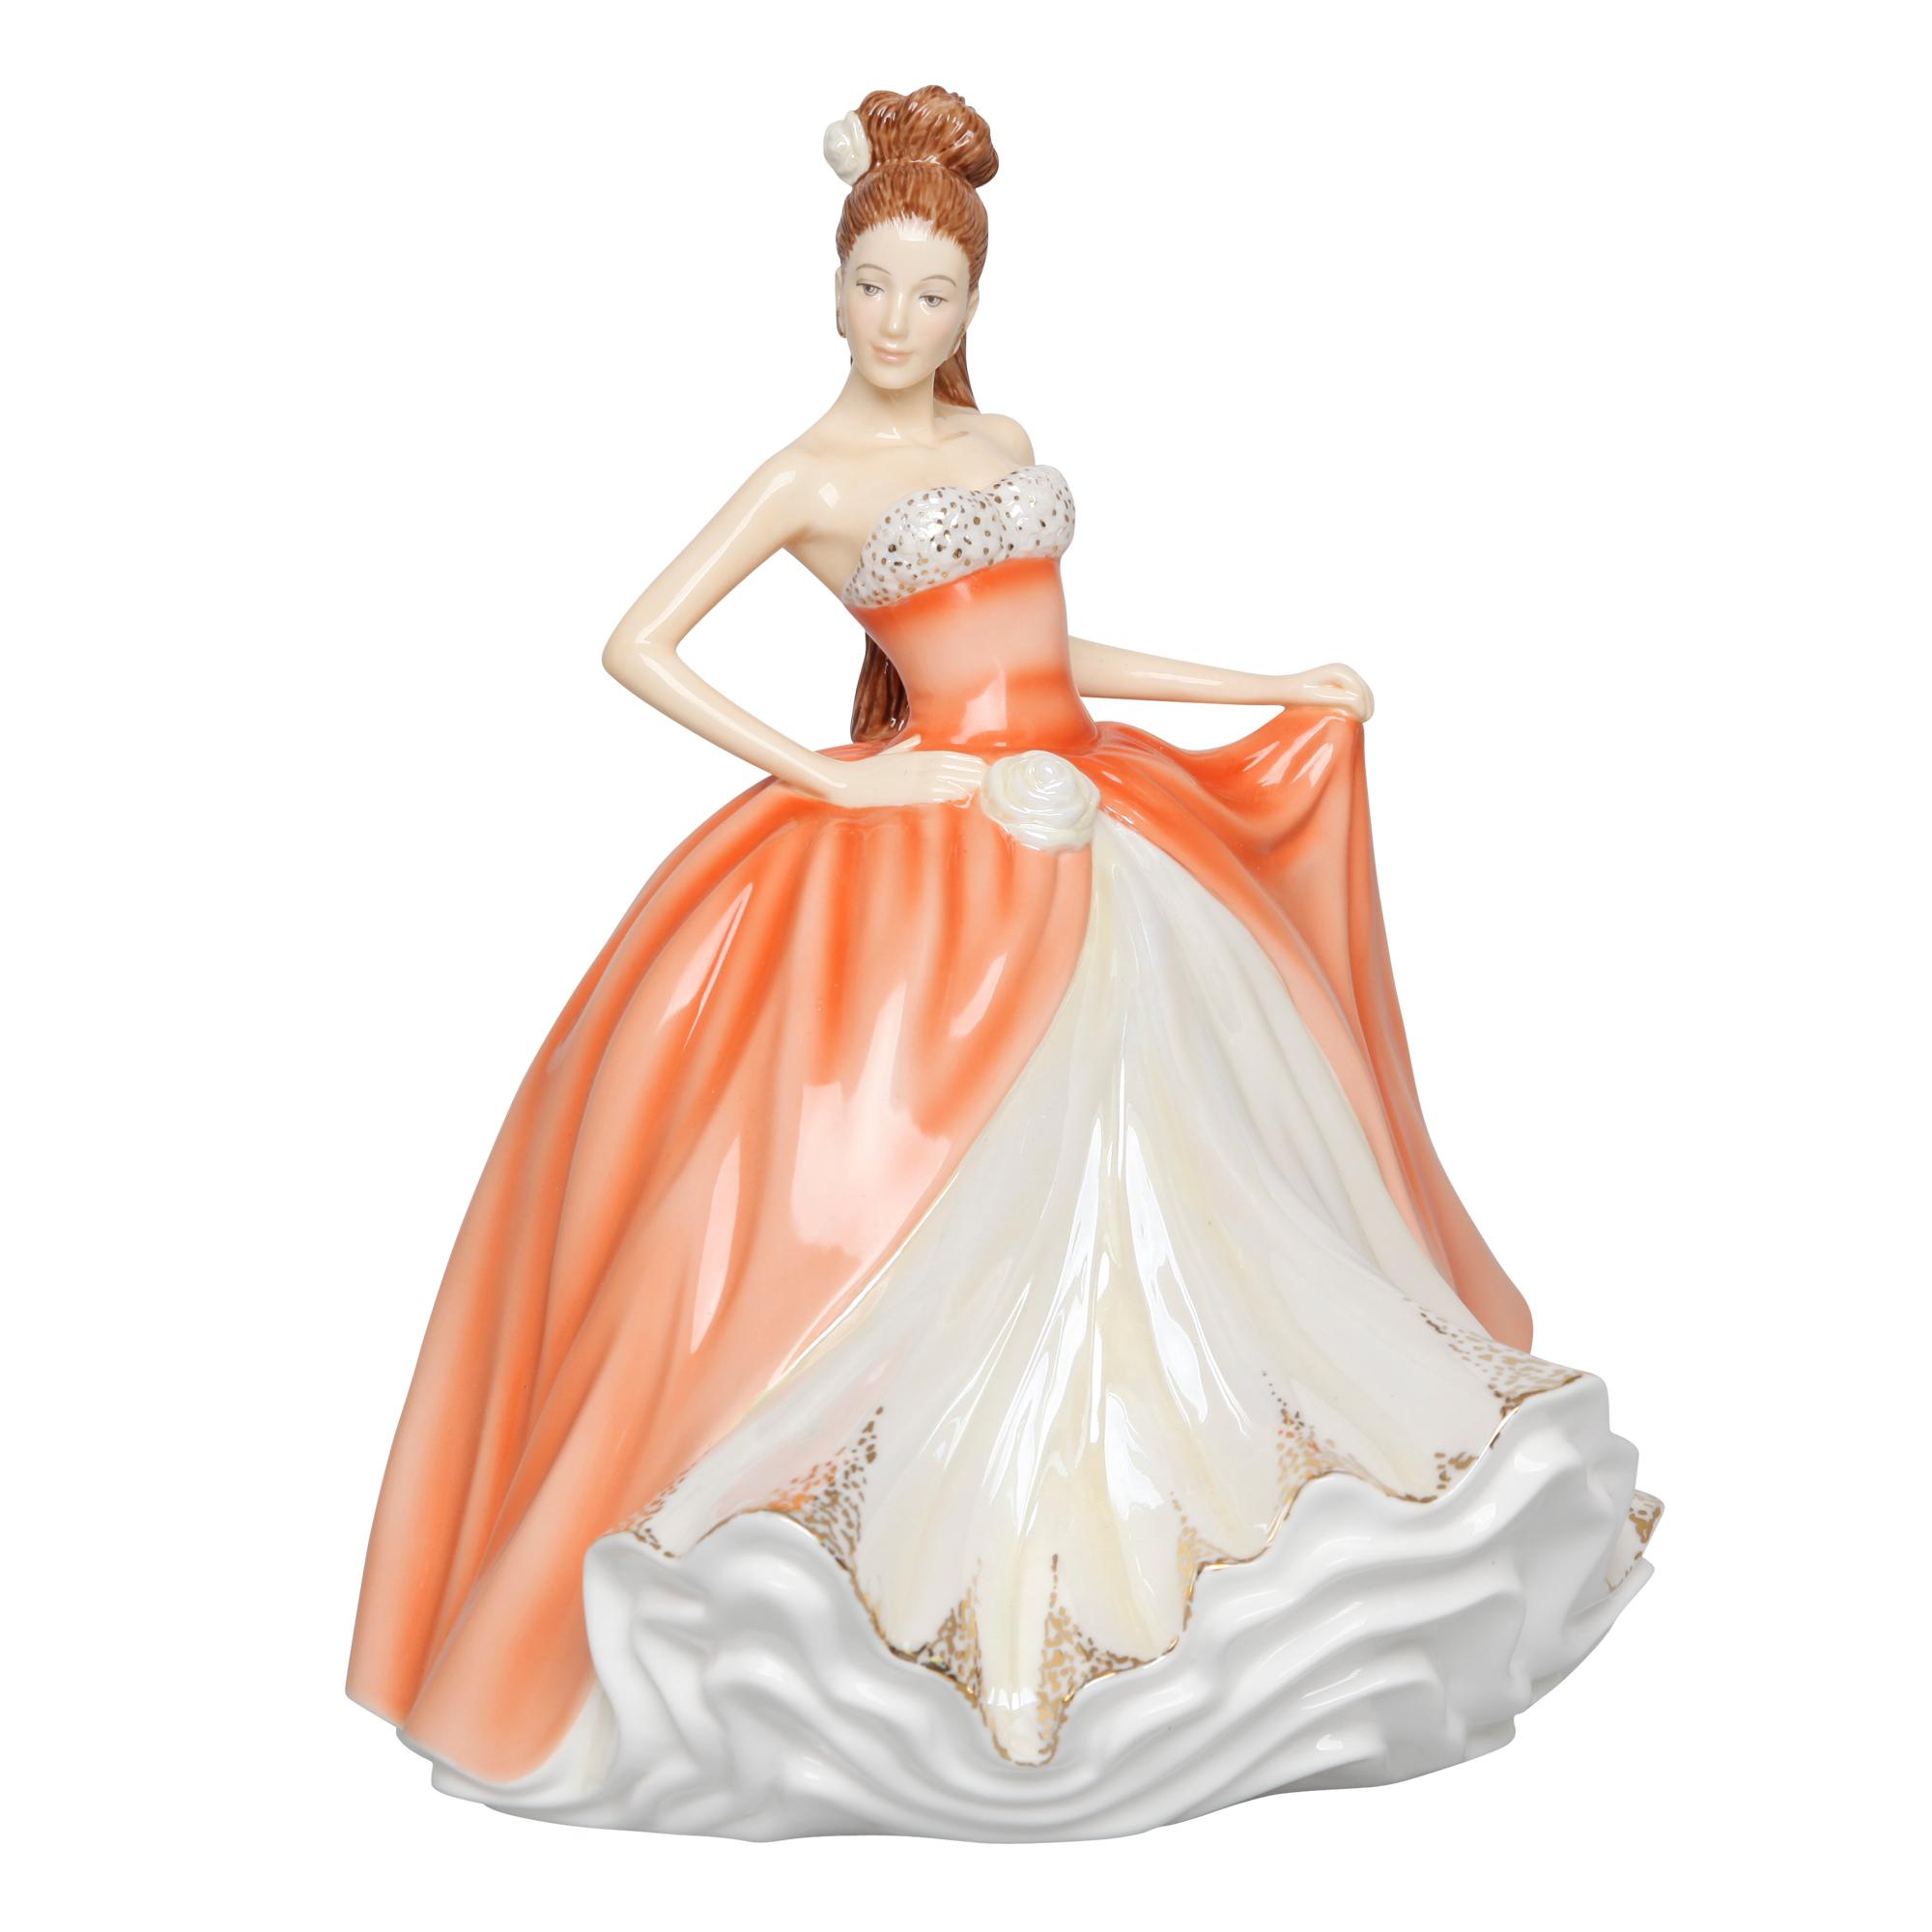 Amber - English Ladies Company Figurine